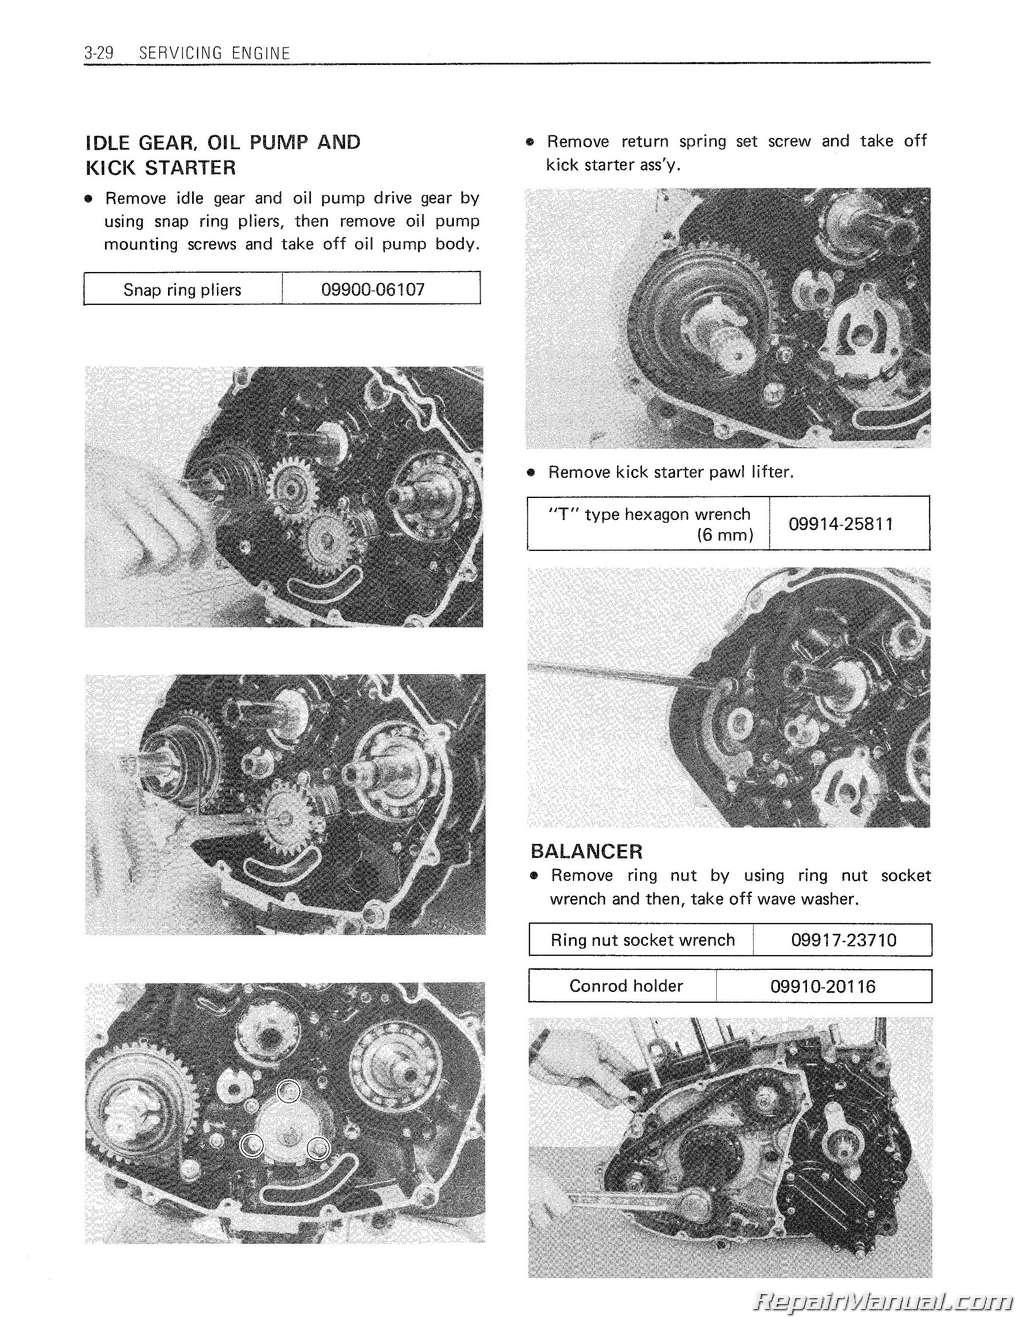 Suzuki Dr Service Manual W10158196a Whirlpool Wiring Schematics 1981 1983 Dr500 Sp500 Motorcycle Printed Rh Repairmanual Com 125 Pdf 200 Free